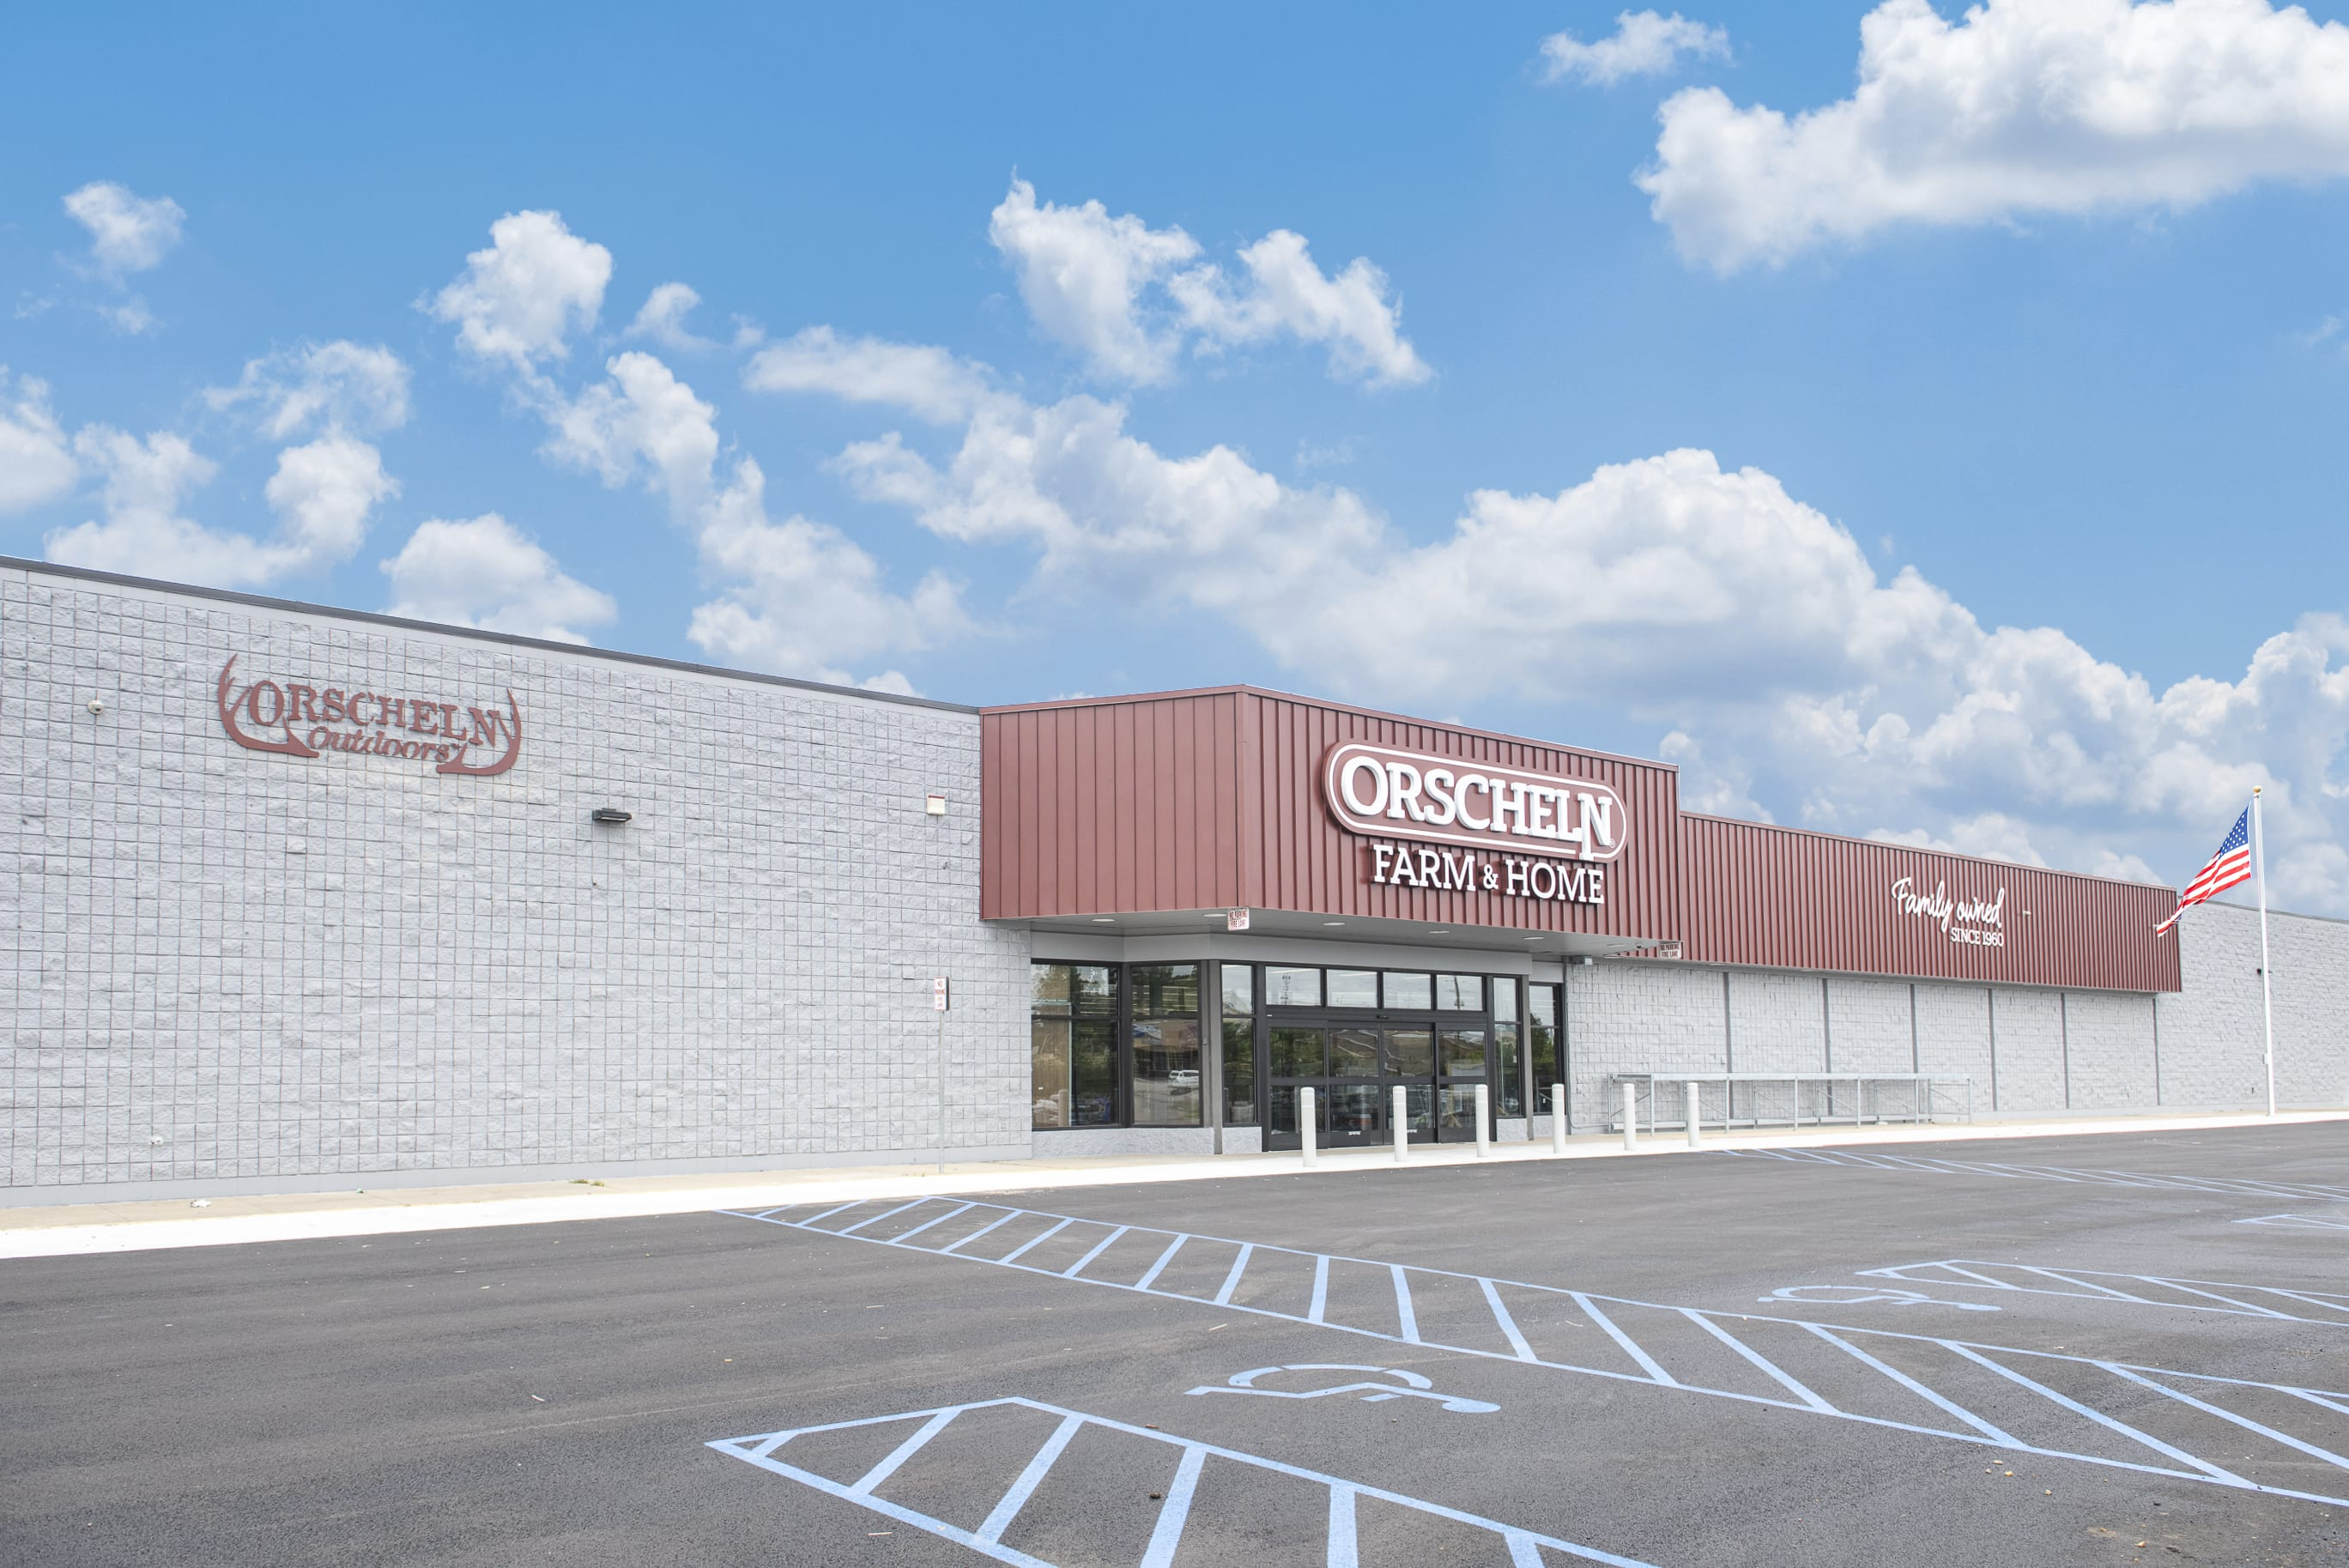 Front view of Orscheln Farm & Home Store in Poplar Bluff, Missouri 63901